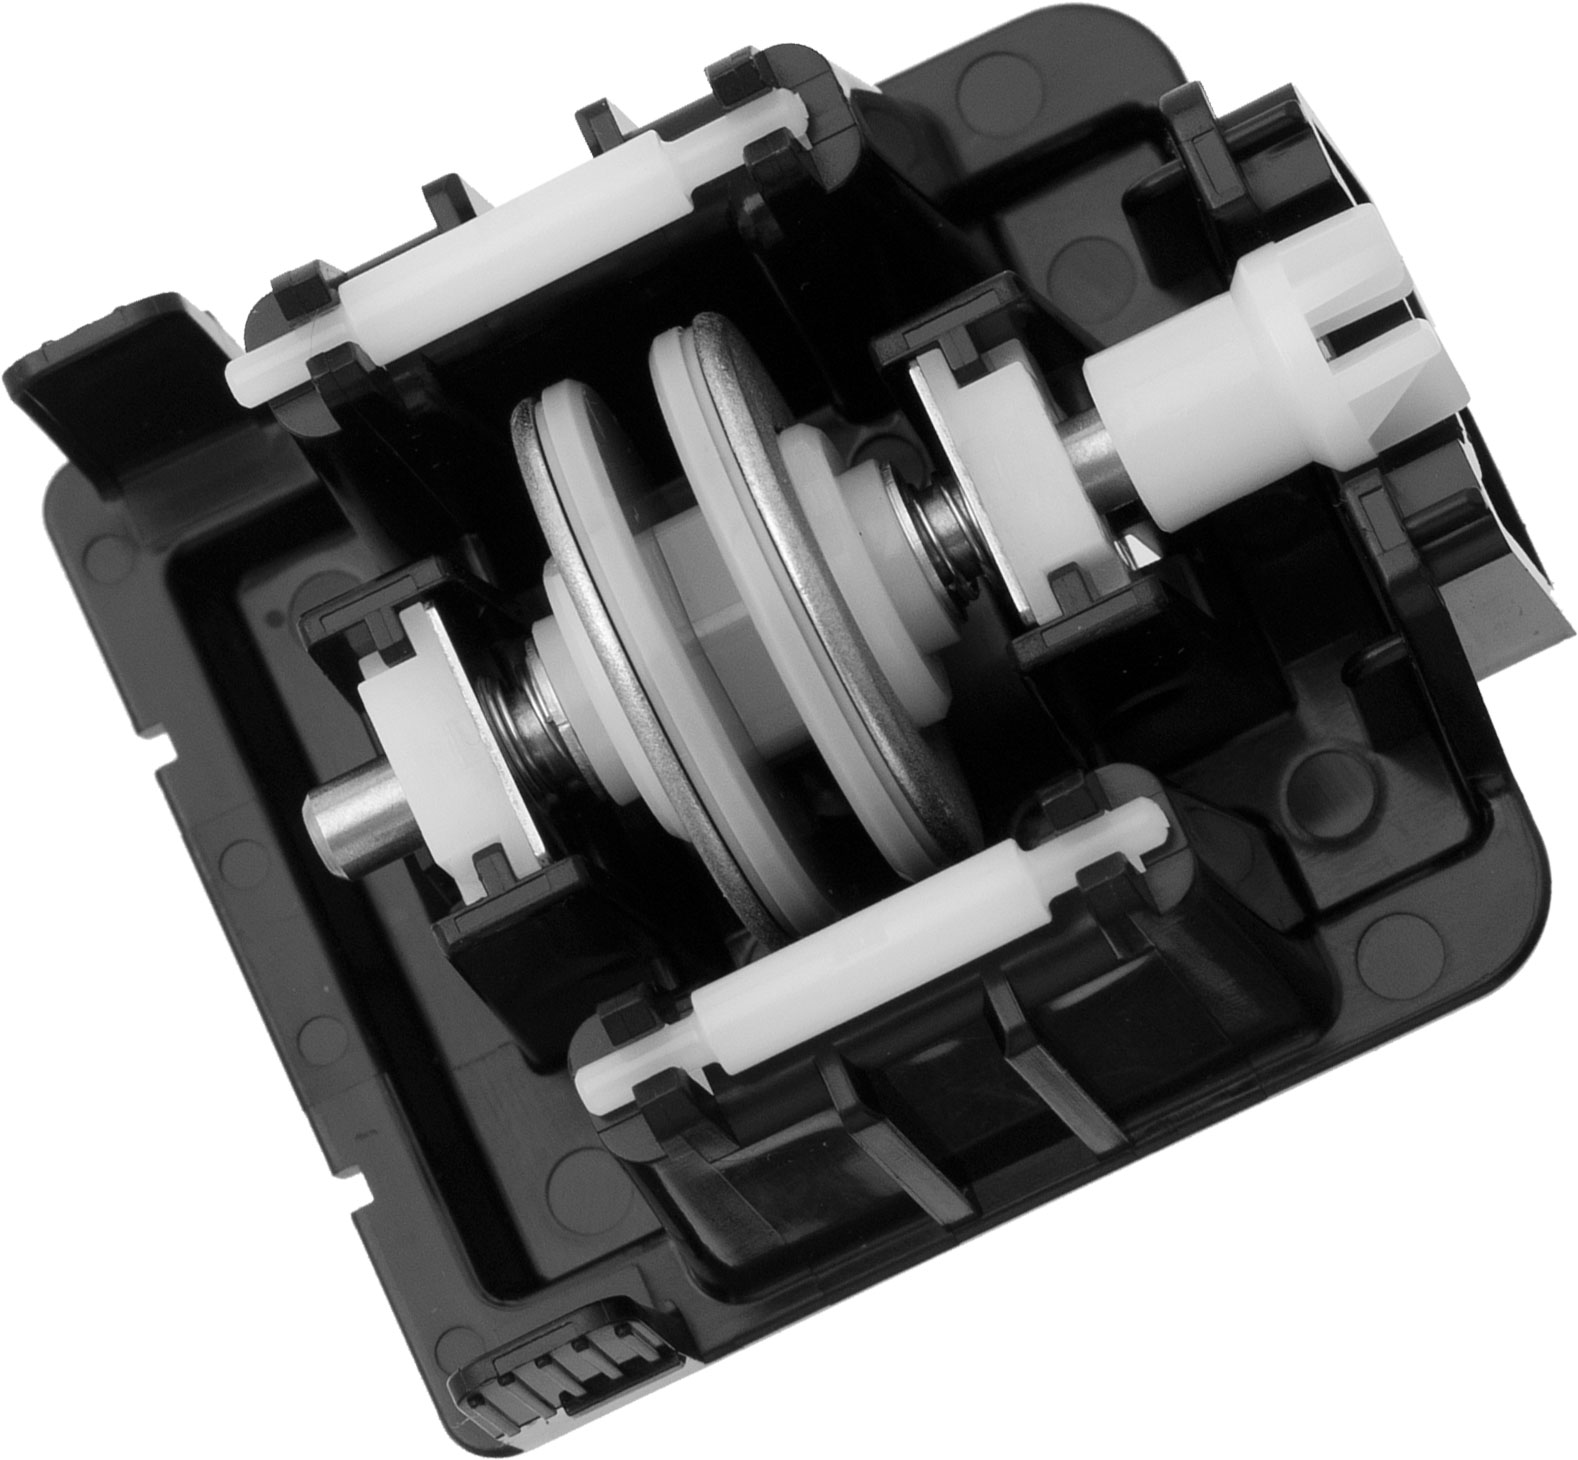 Kyocera Replacement Diamond Wheel Grinder for Battery Powered Ceramic Knife Sharpener